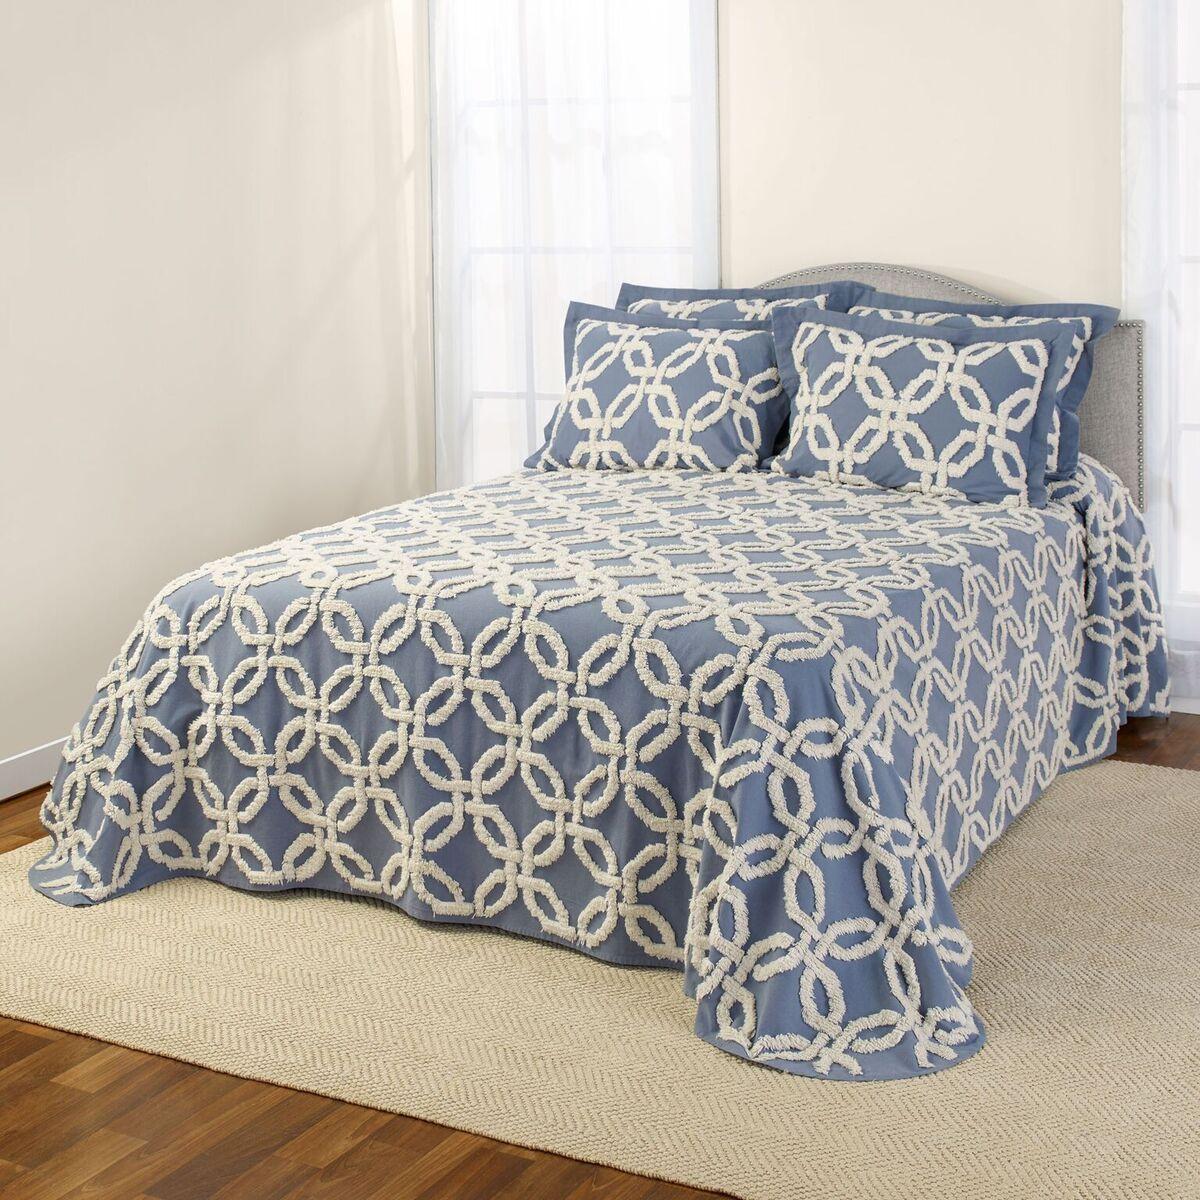 Chenille Bedspreads.Holden Chenille Bedspread Harbor Blue